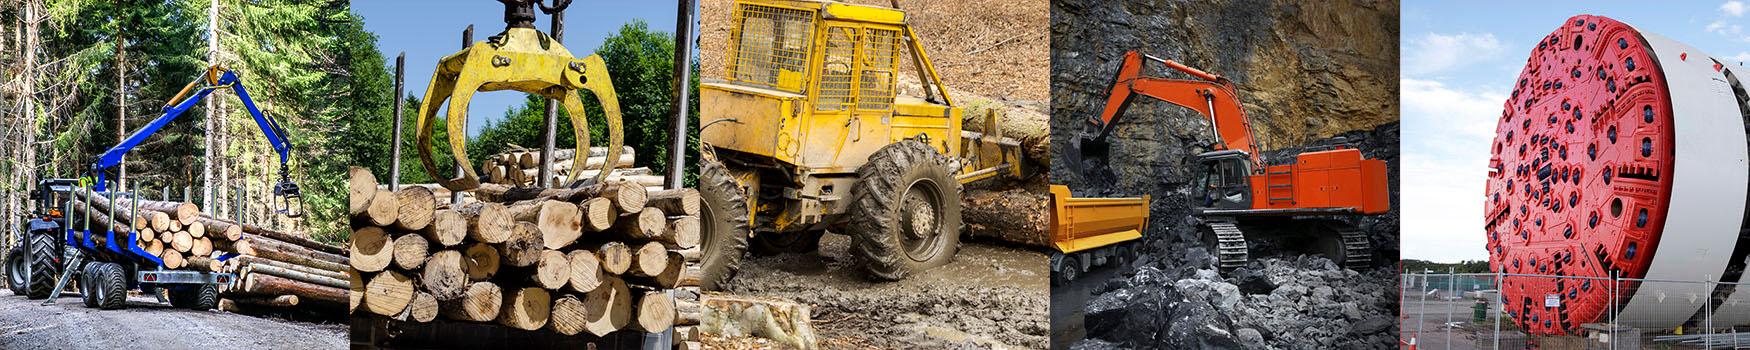 Transporter,Loading with Clipper Cut Logs,Skidder,Mining Loader,Tunnel Boring Machine